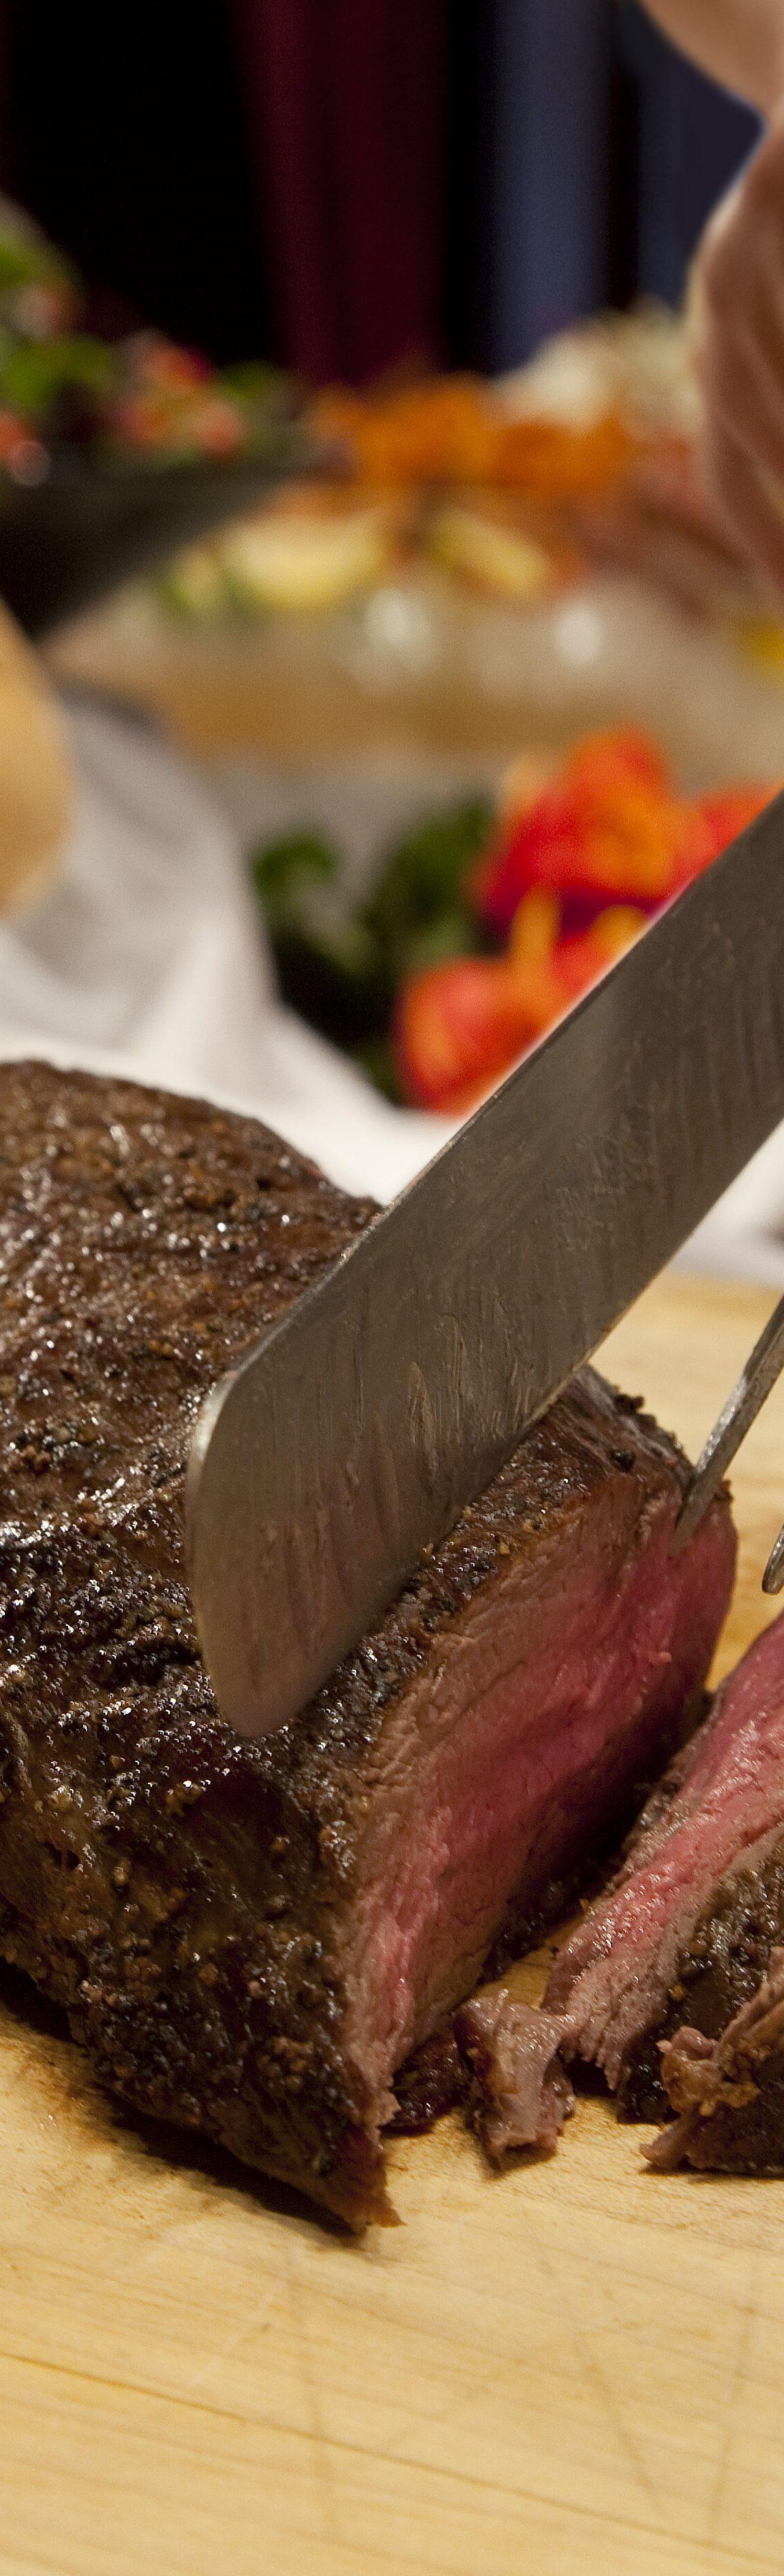 Ruth's Chris Steak House at BITE NW Arkansas